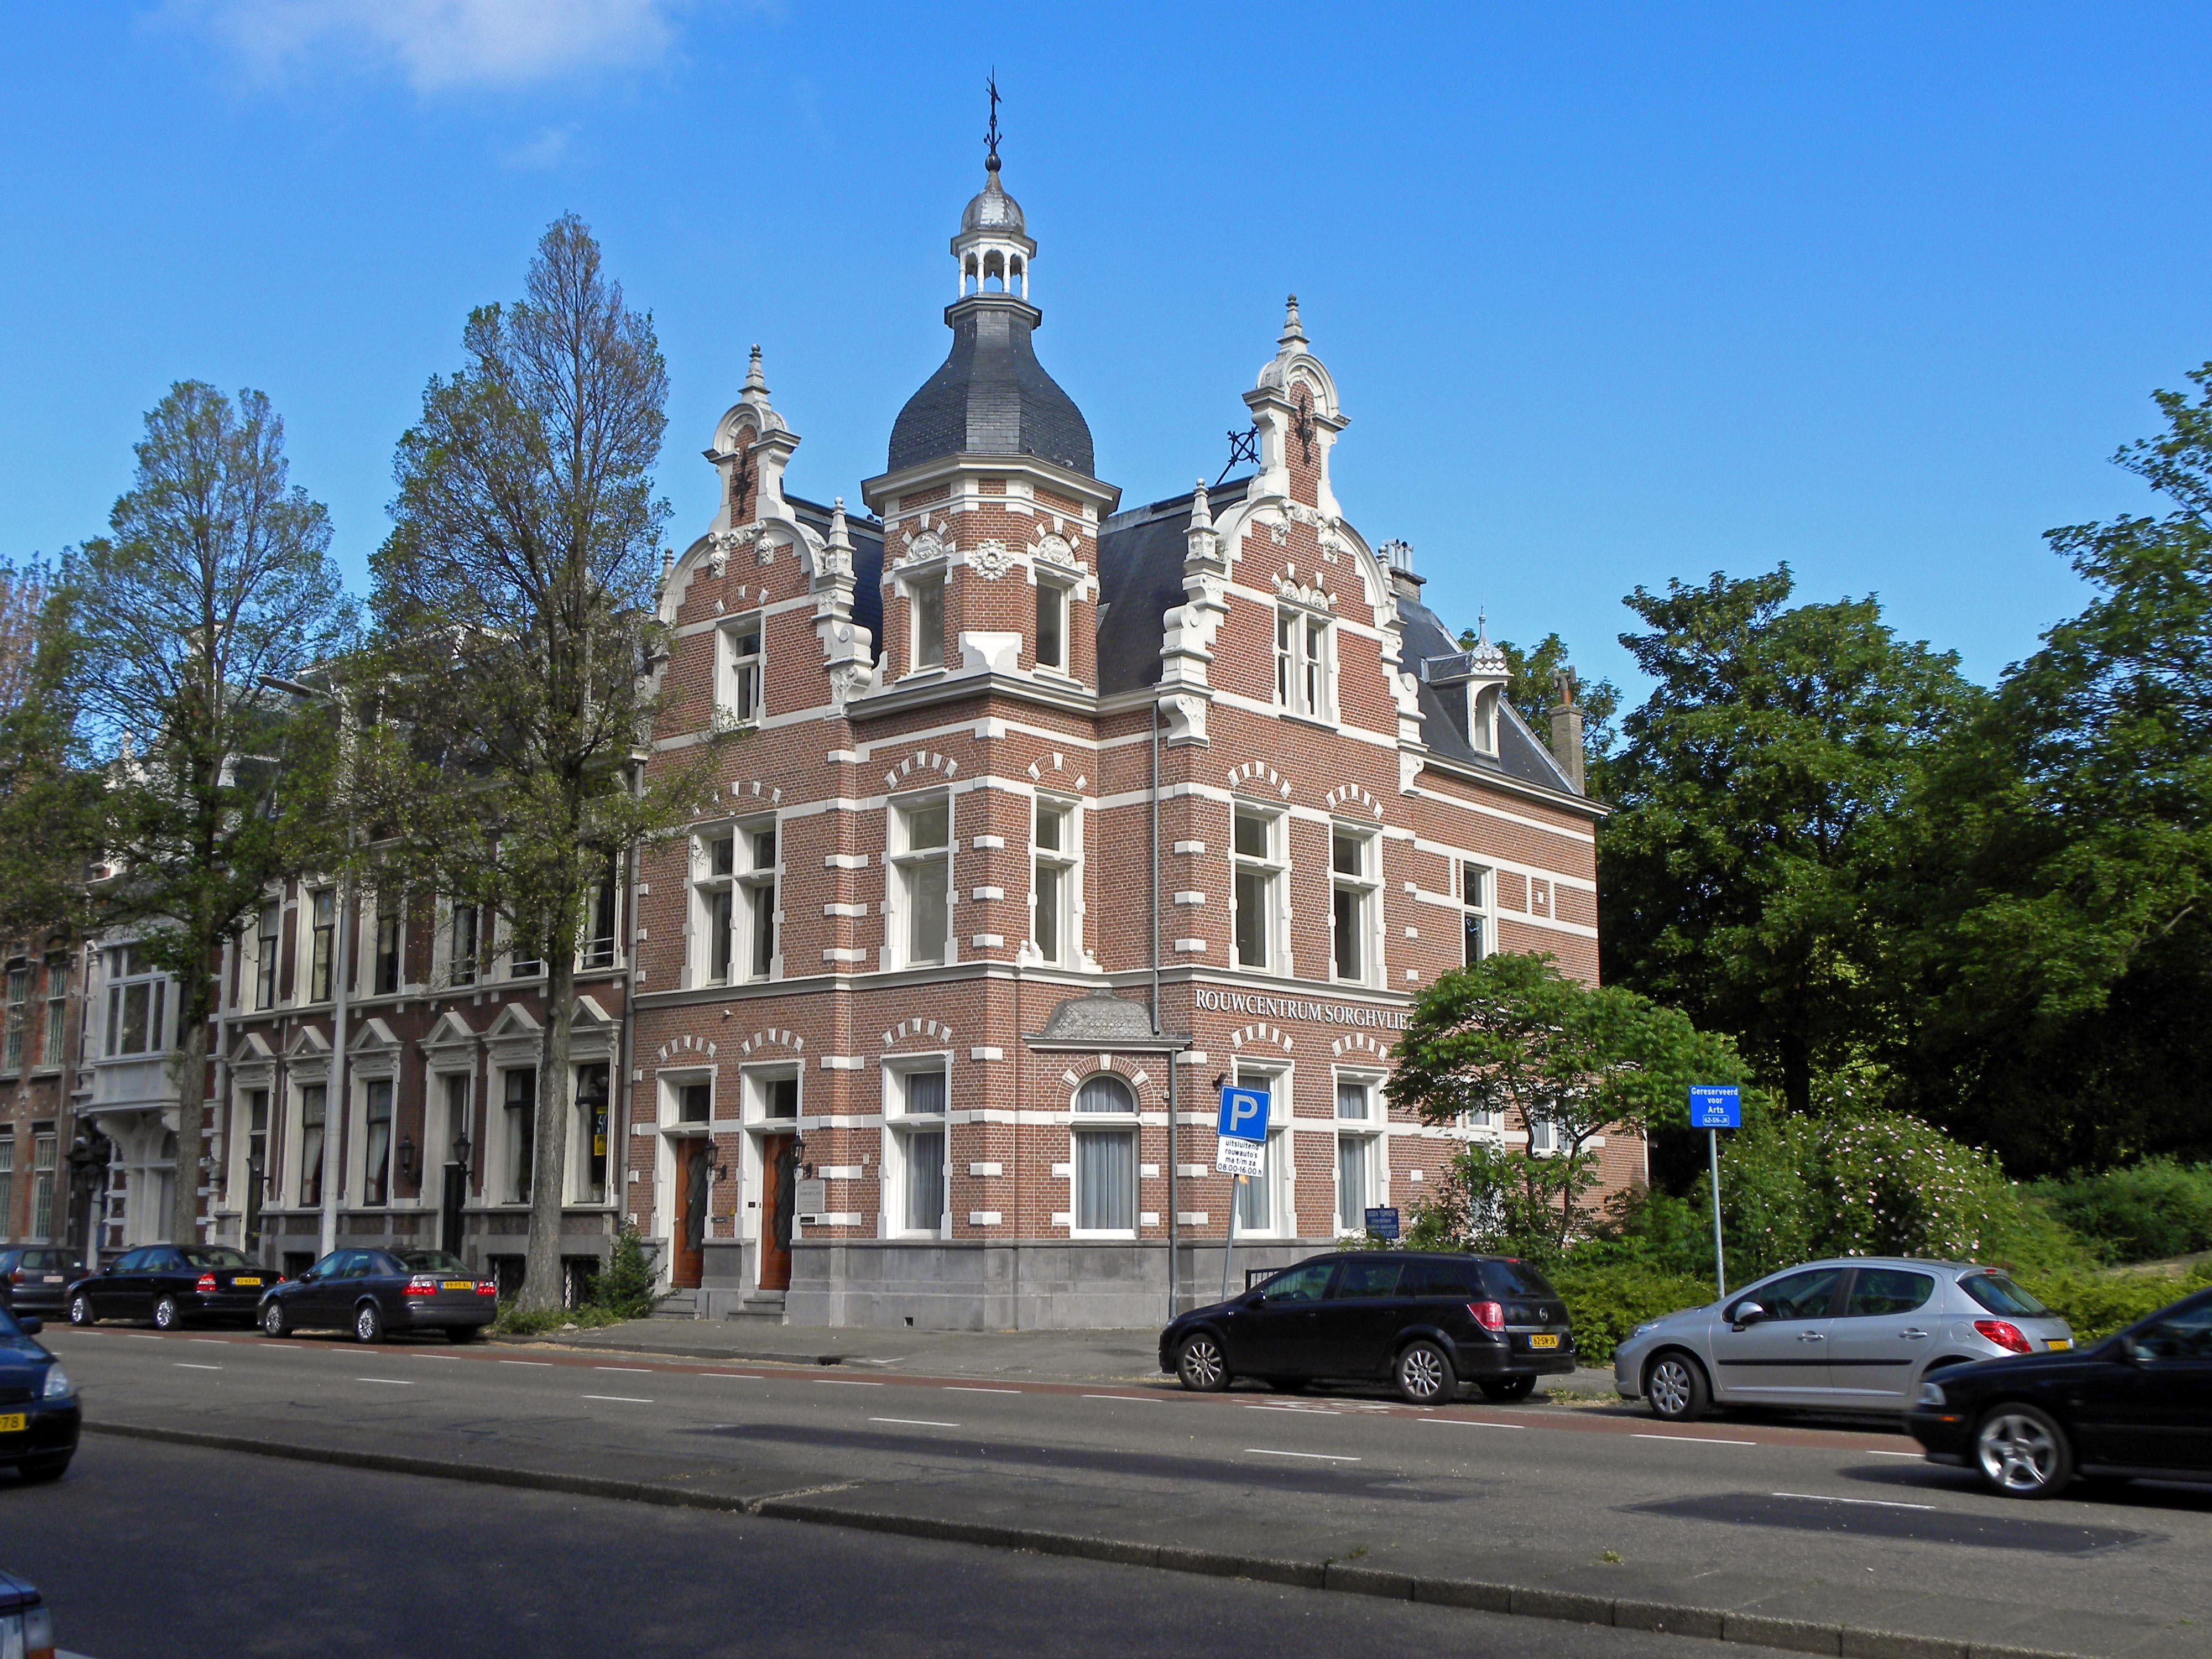 Statenkwartier and Duinoord